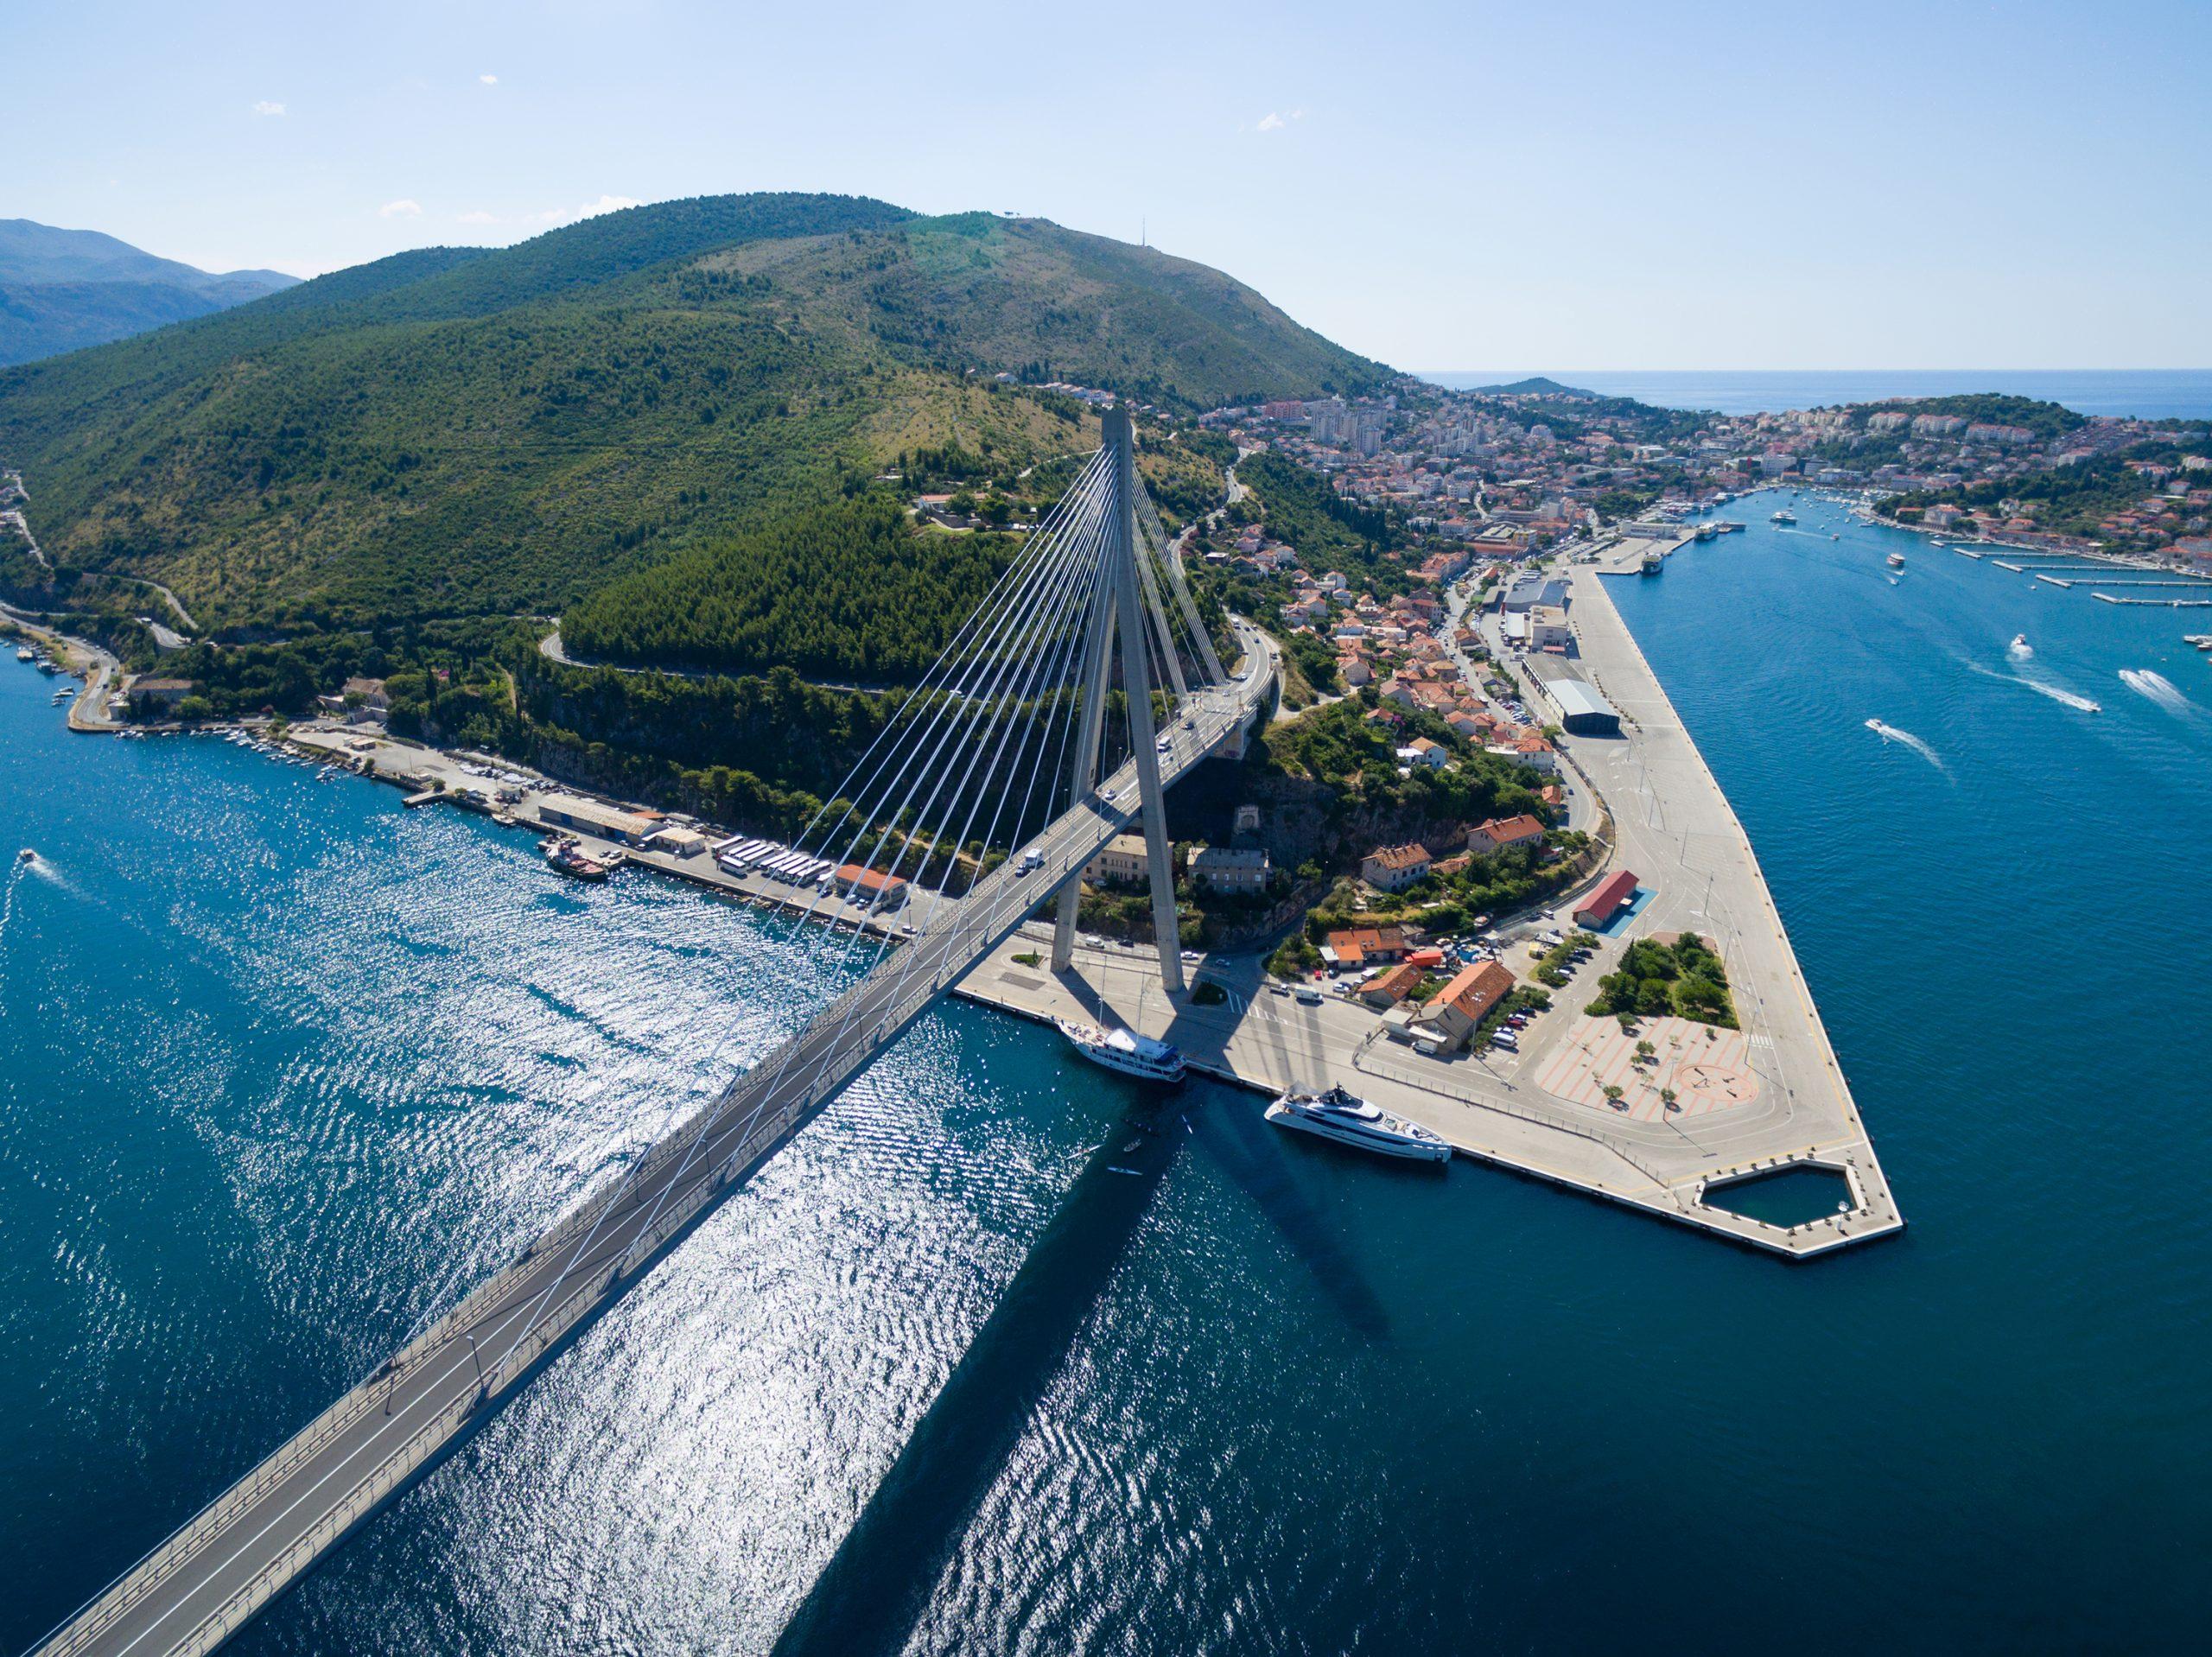 See The Impressive Dubrovnik Bridge On Your Dubrovnik City Tour